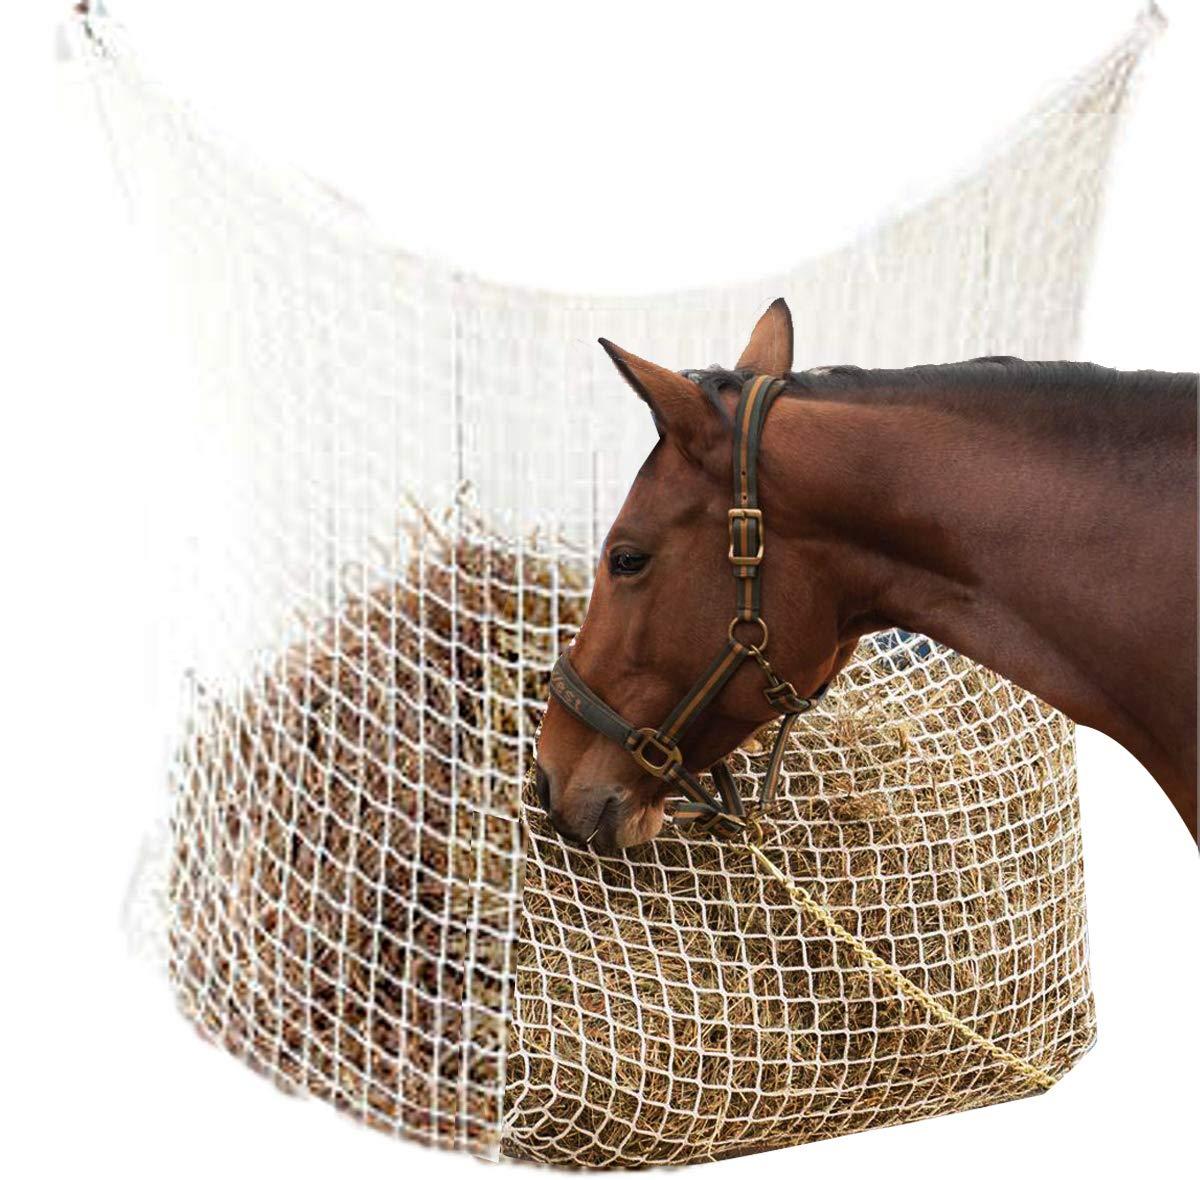 NRTFE Hay Net Slow Feed Bag for Horse Feeder Full Day Feeding Grazing Extra Large (63''x40'') by NRTFE